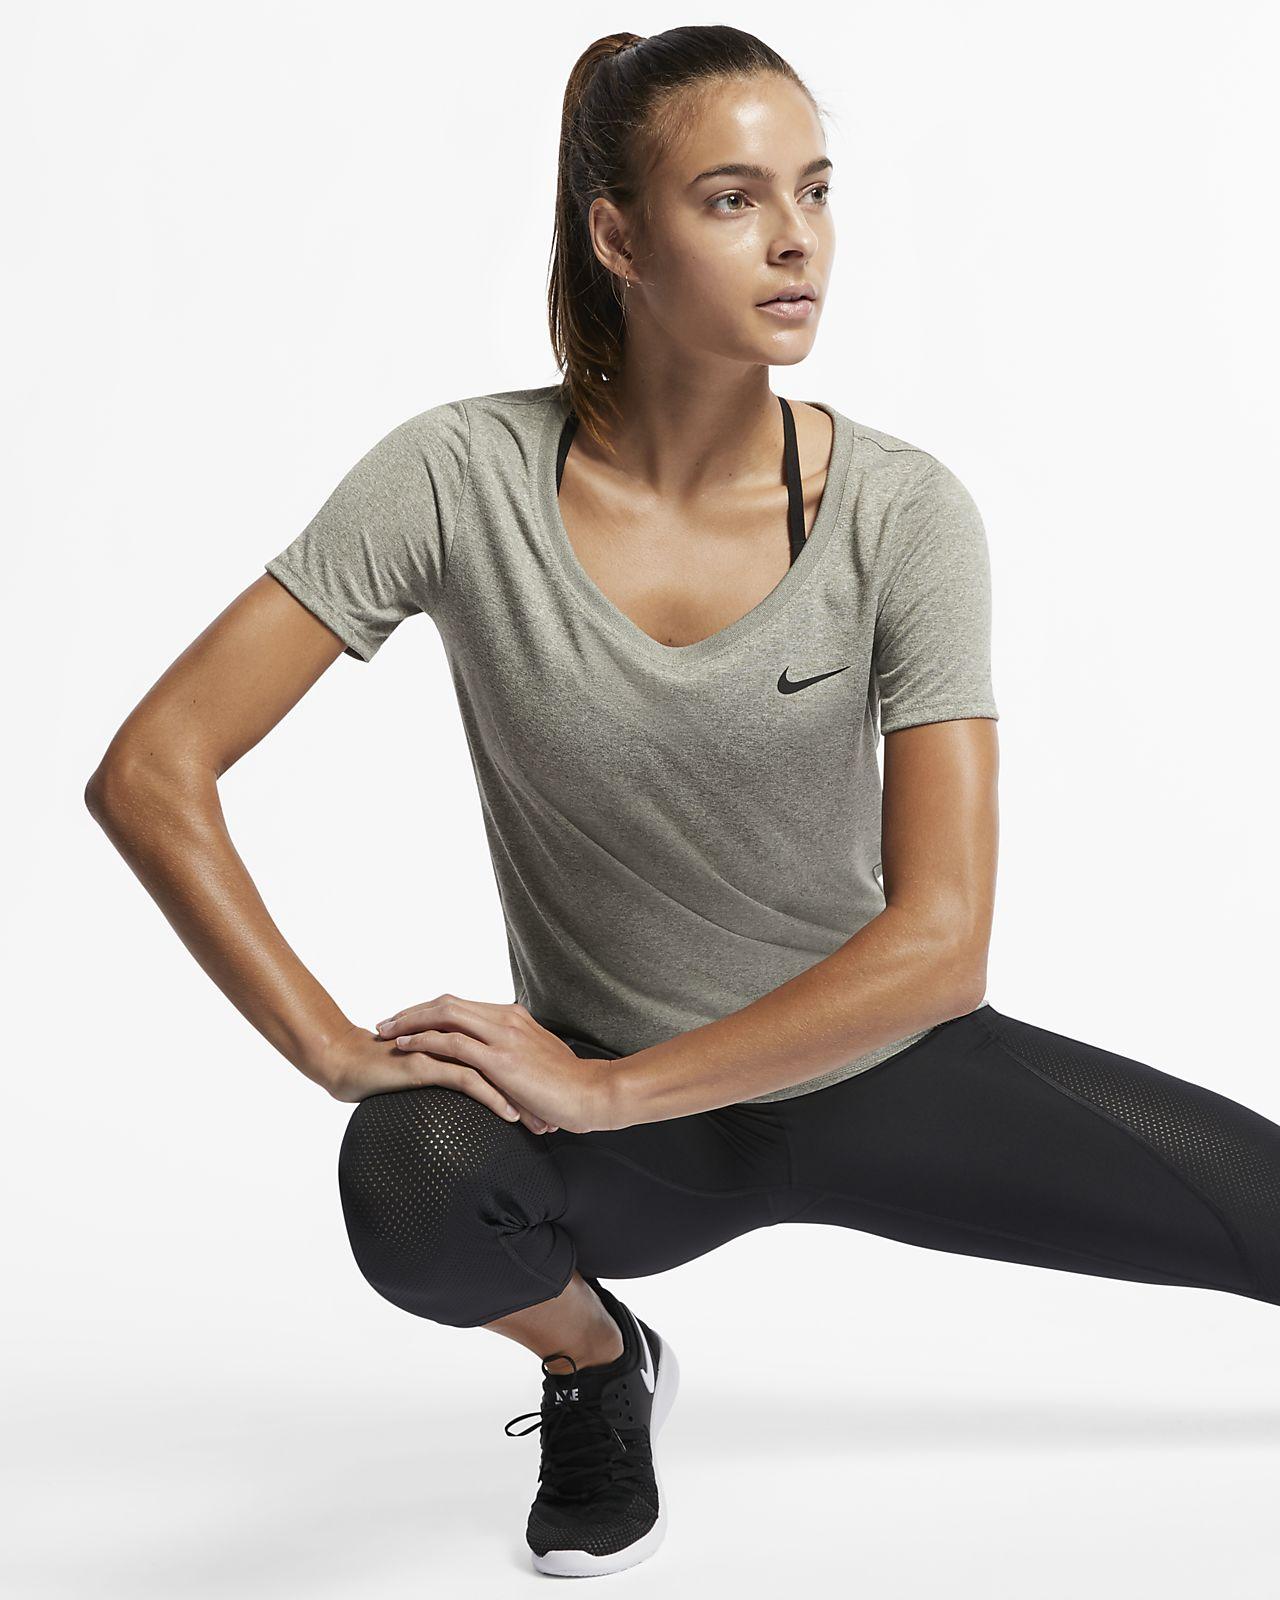 798495a0e92b Nike Dri-FIT Women s Training T-Shirt. Nike.com